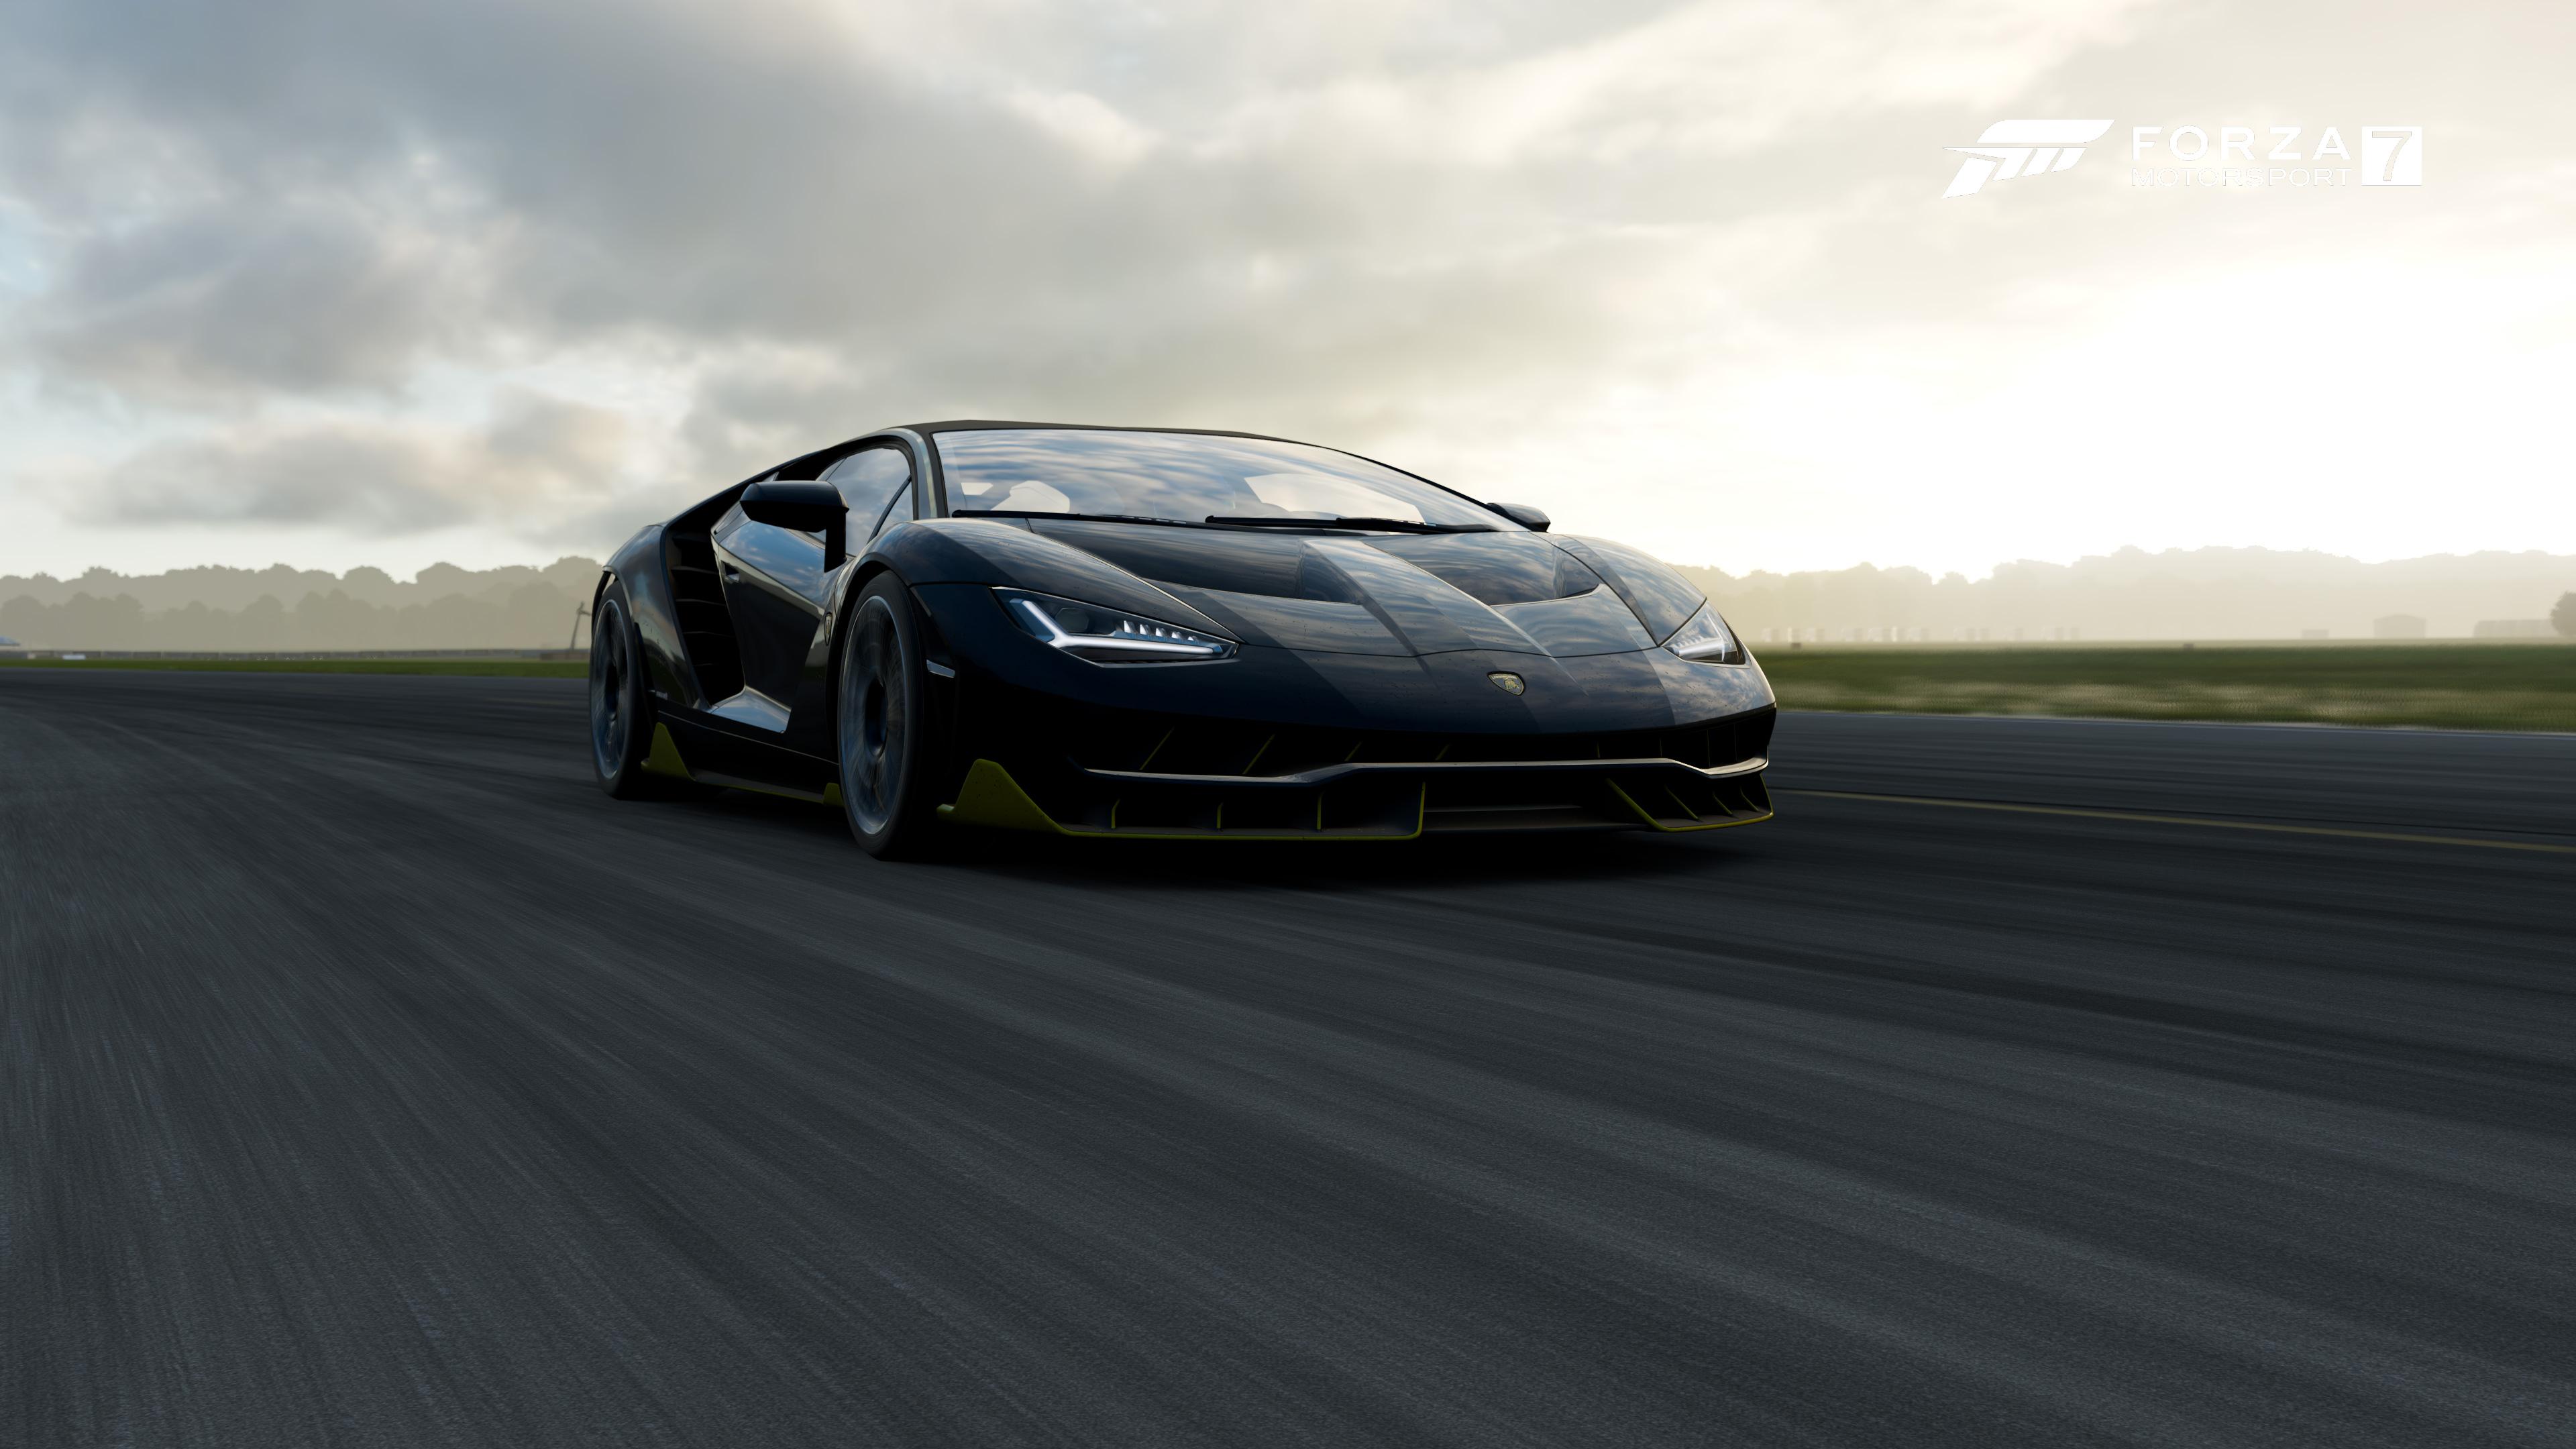 Lamborghini Centenario Forza Motorsport 7 4k Hd Games 4k